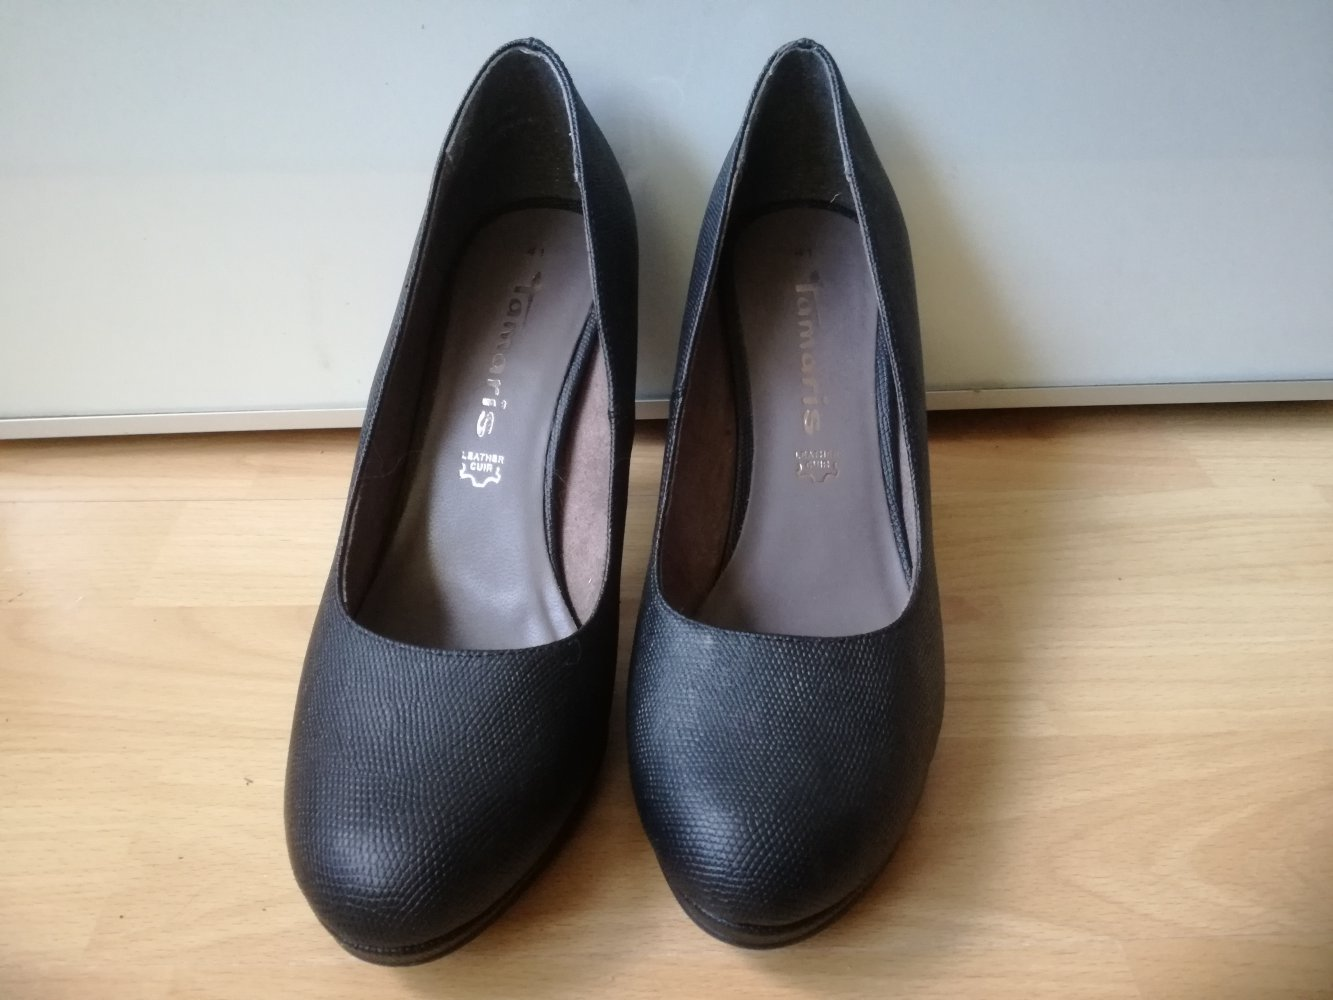 Tamaris Pumps High Heels schwarz super Zustand Gr. 41